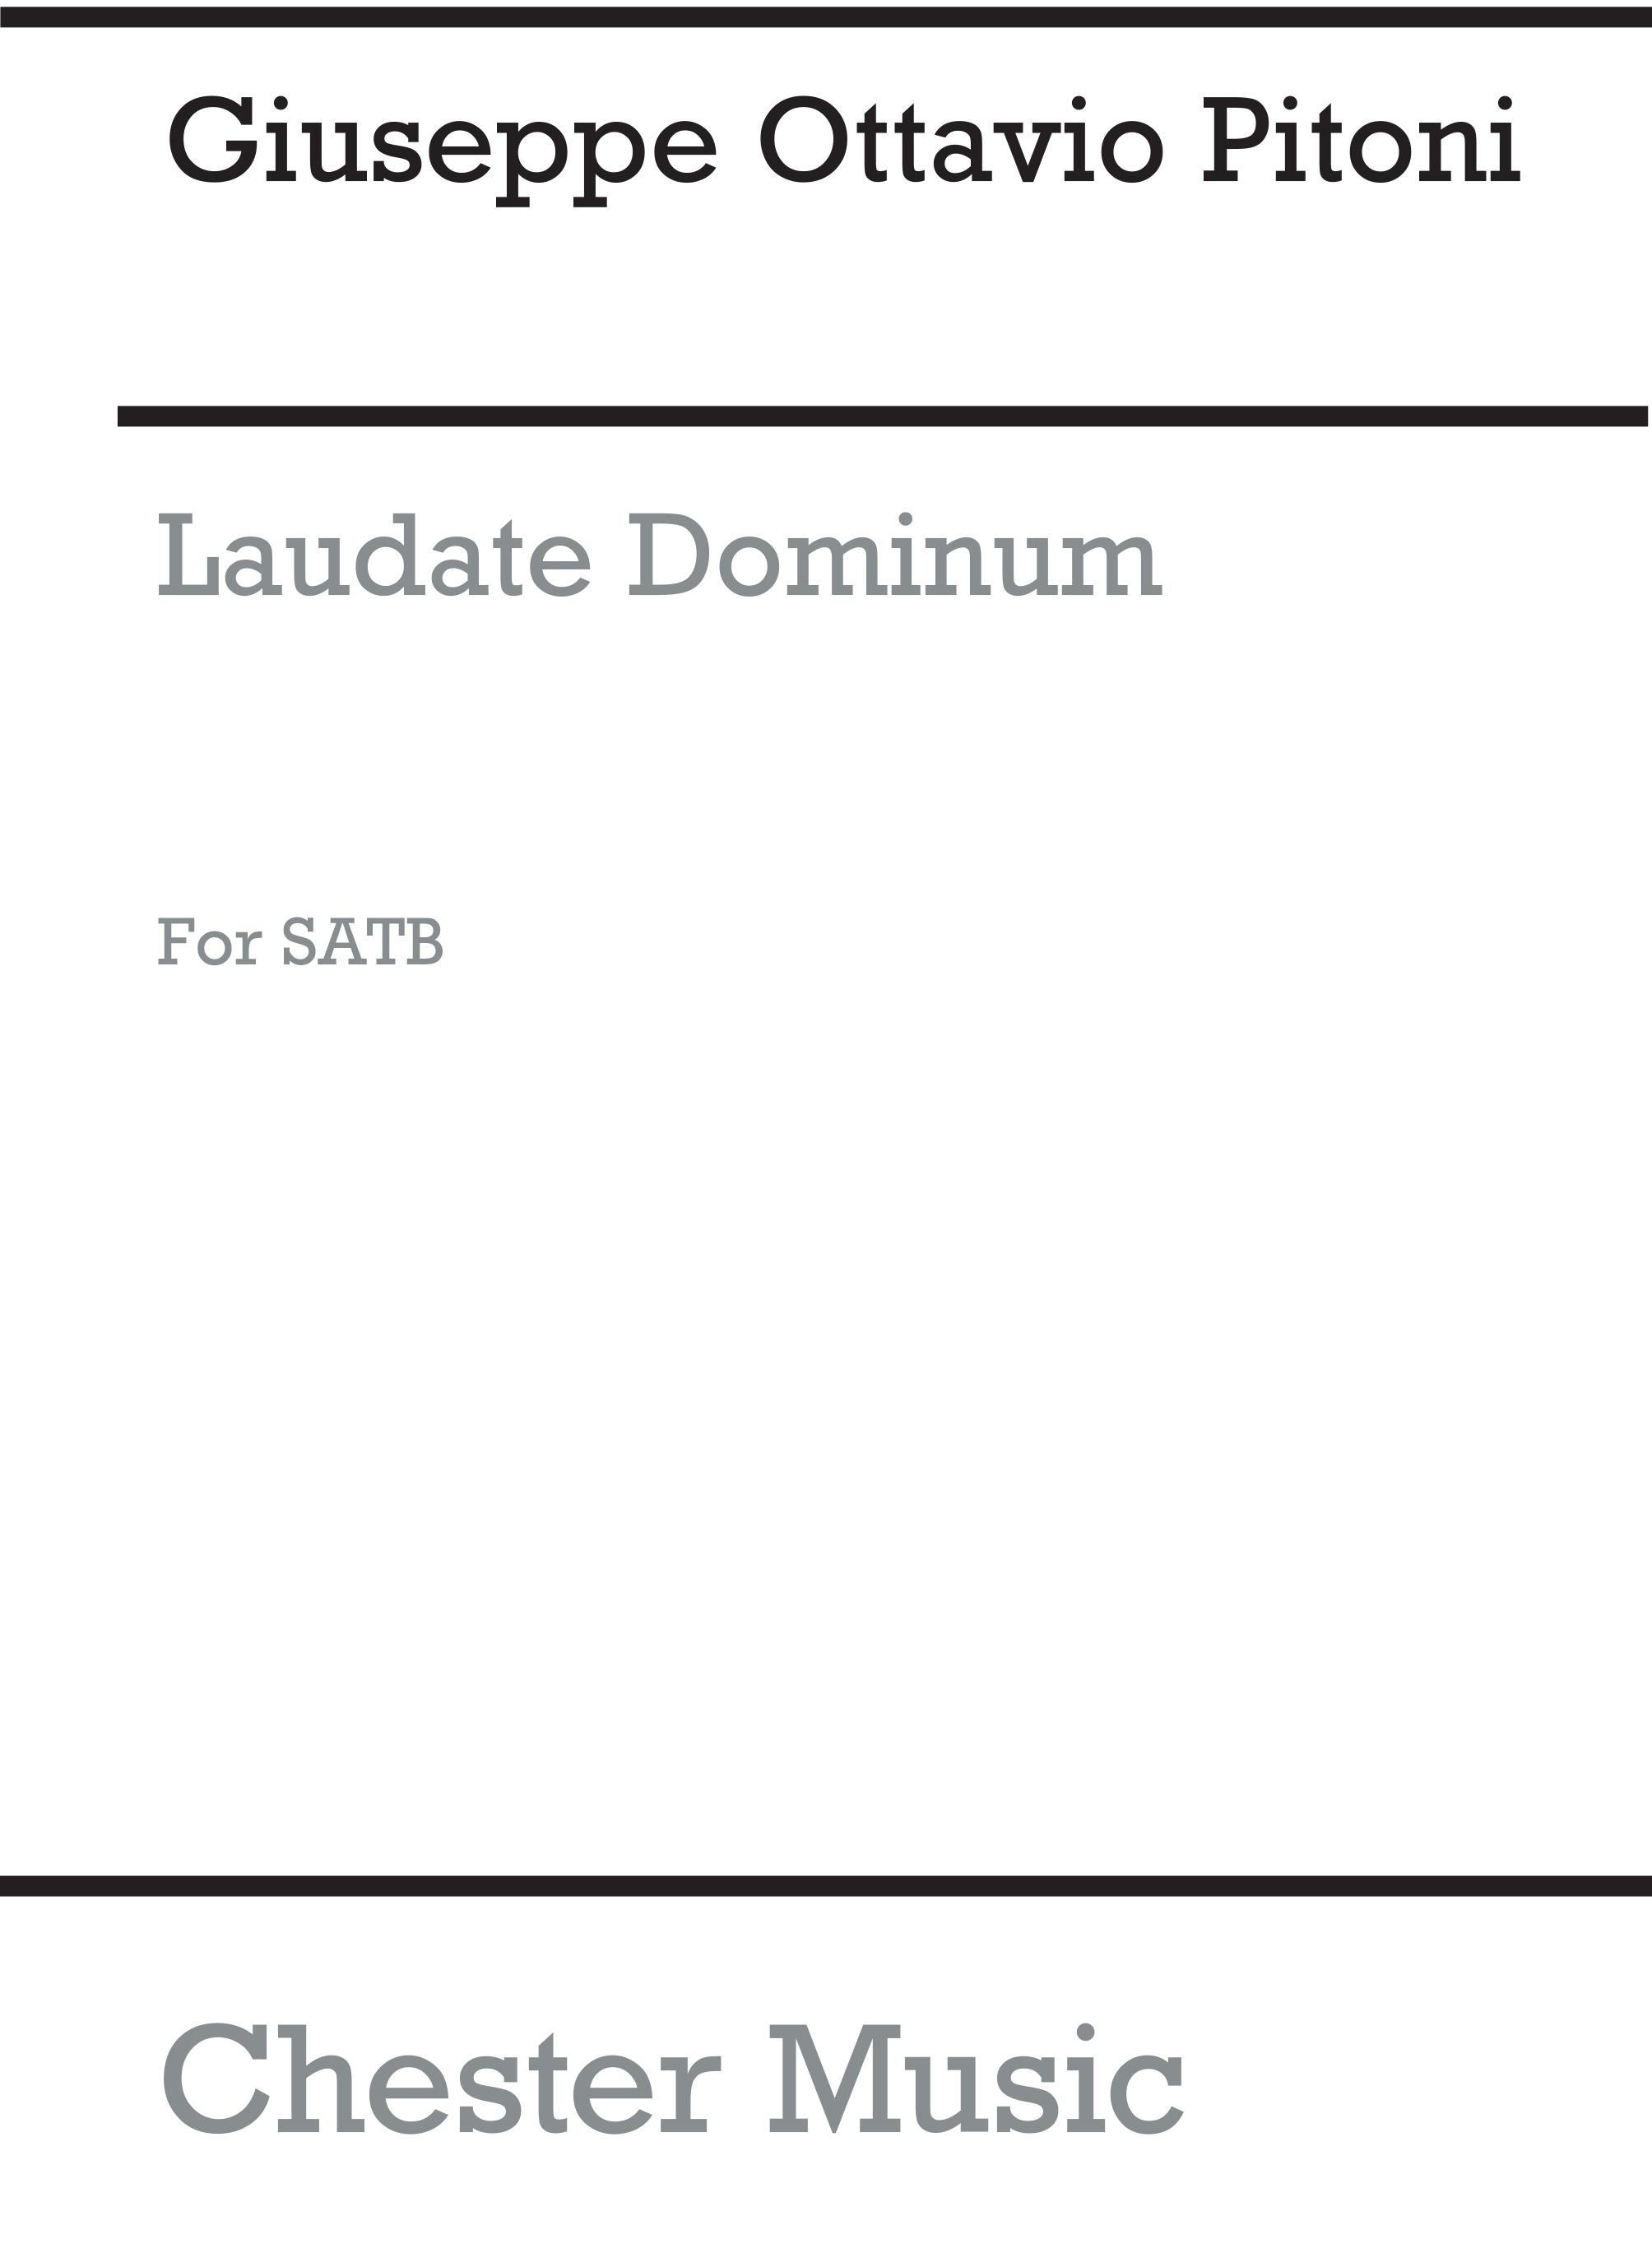 Giuseppe Ottavio Pitoni: Laudate Dominum (Steele) Satb: SATB: Vocal Score